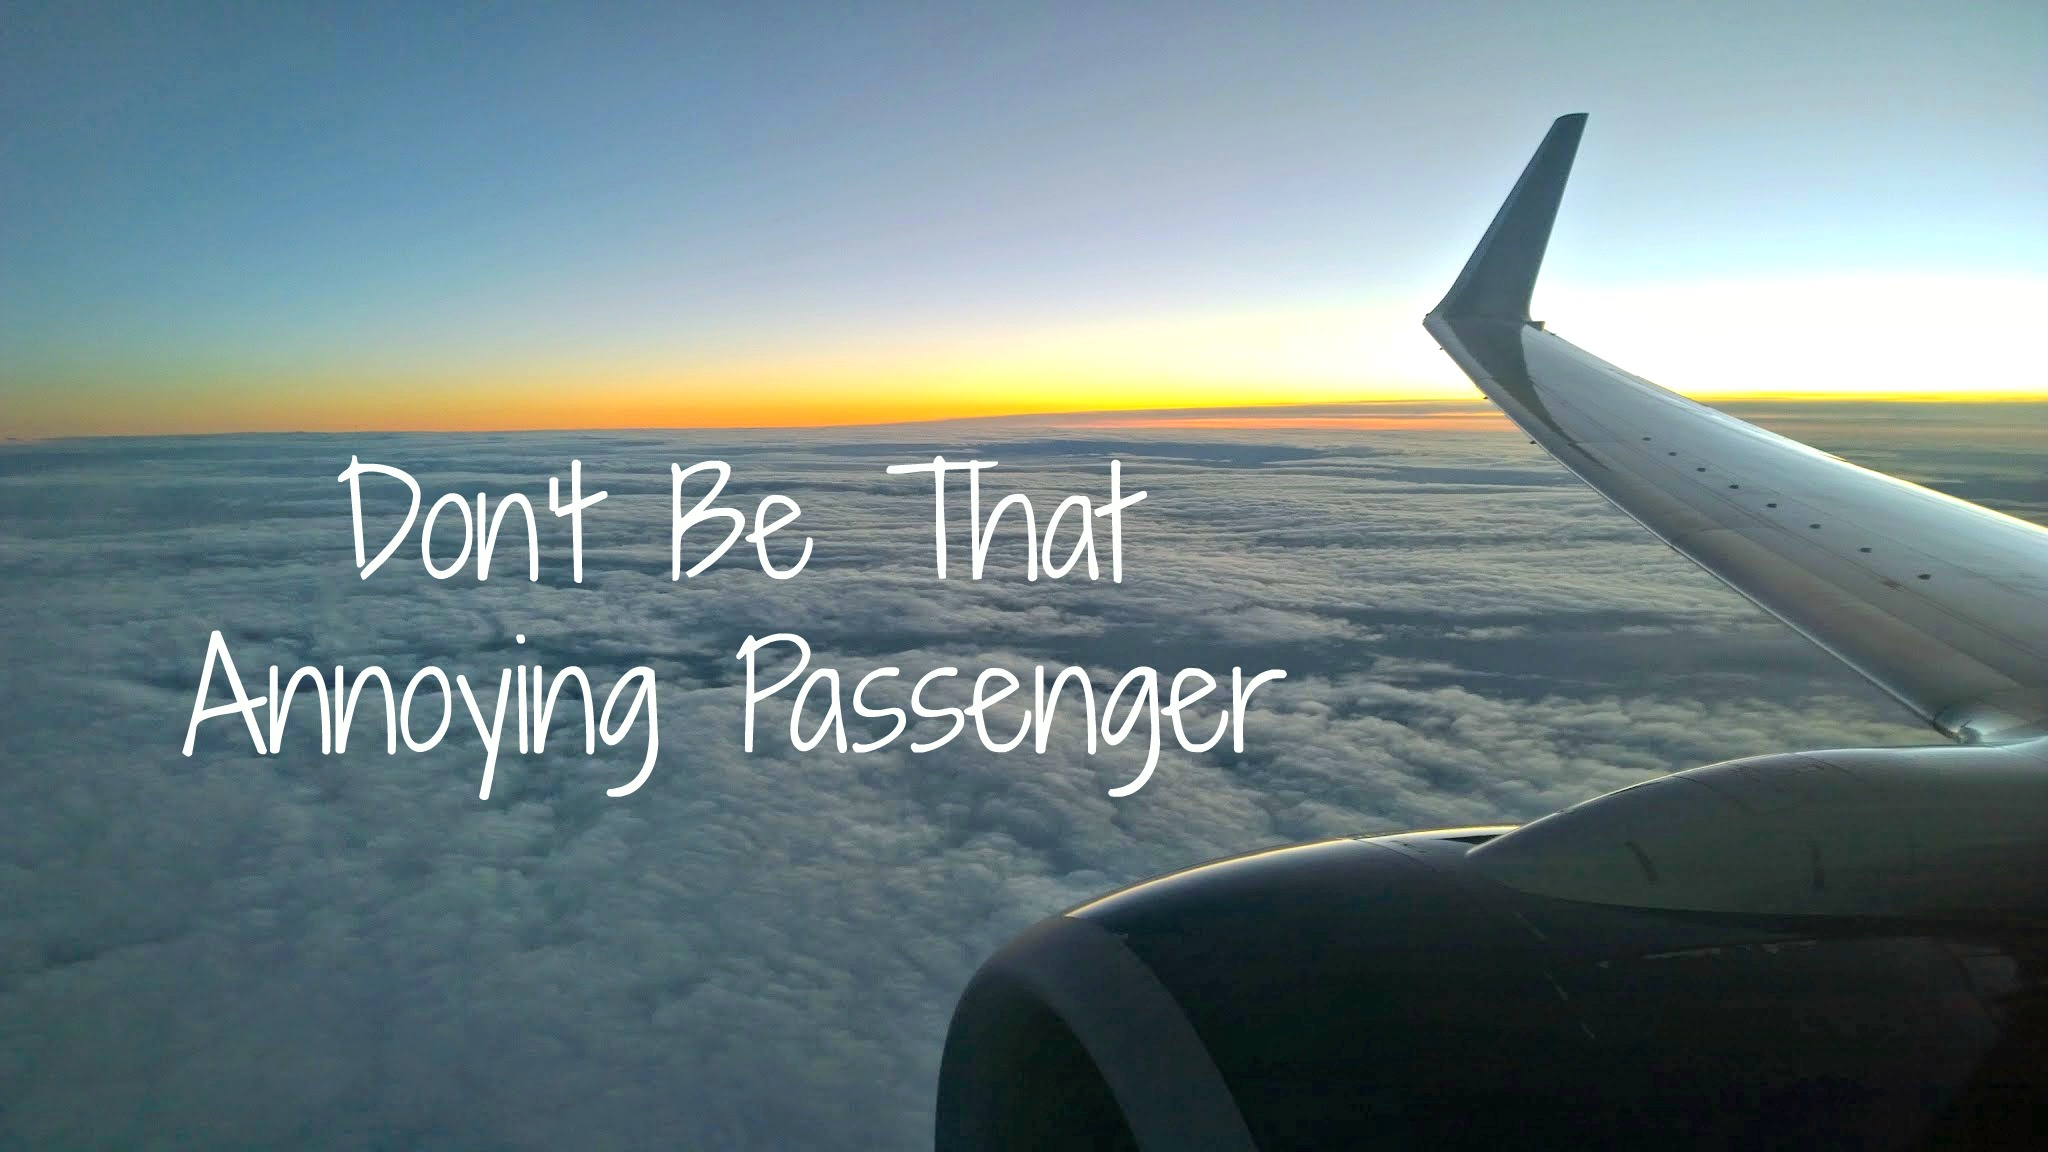 don't be that annoying passenger